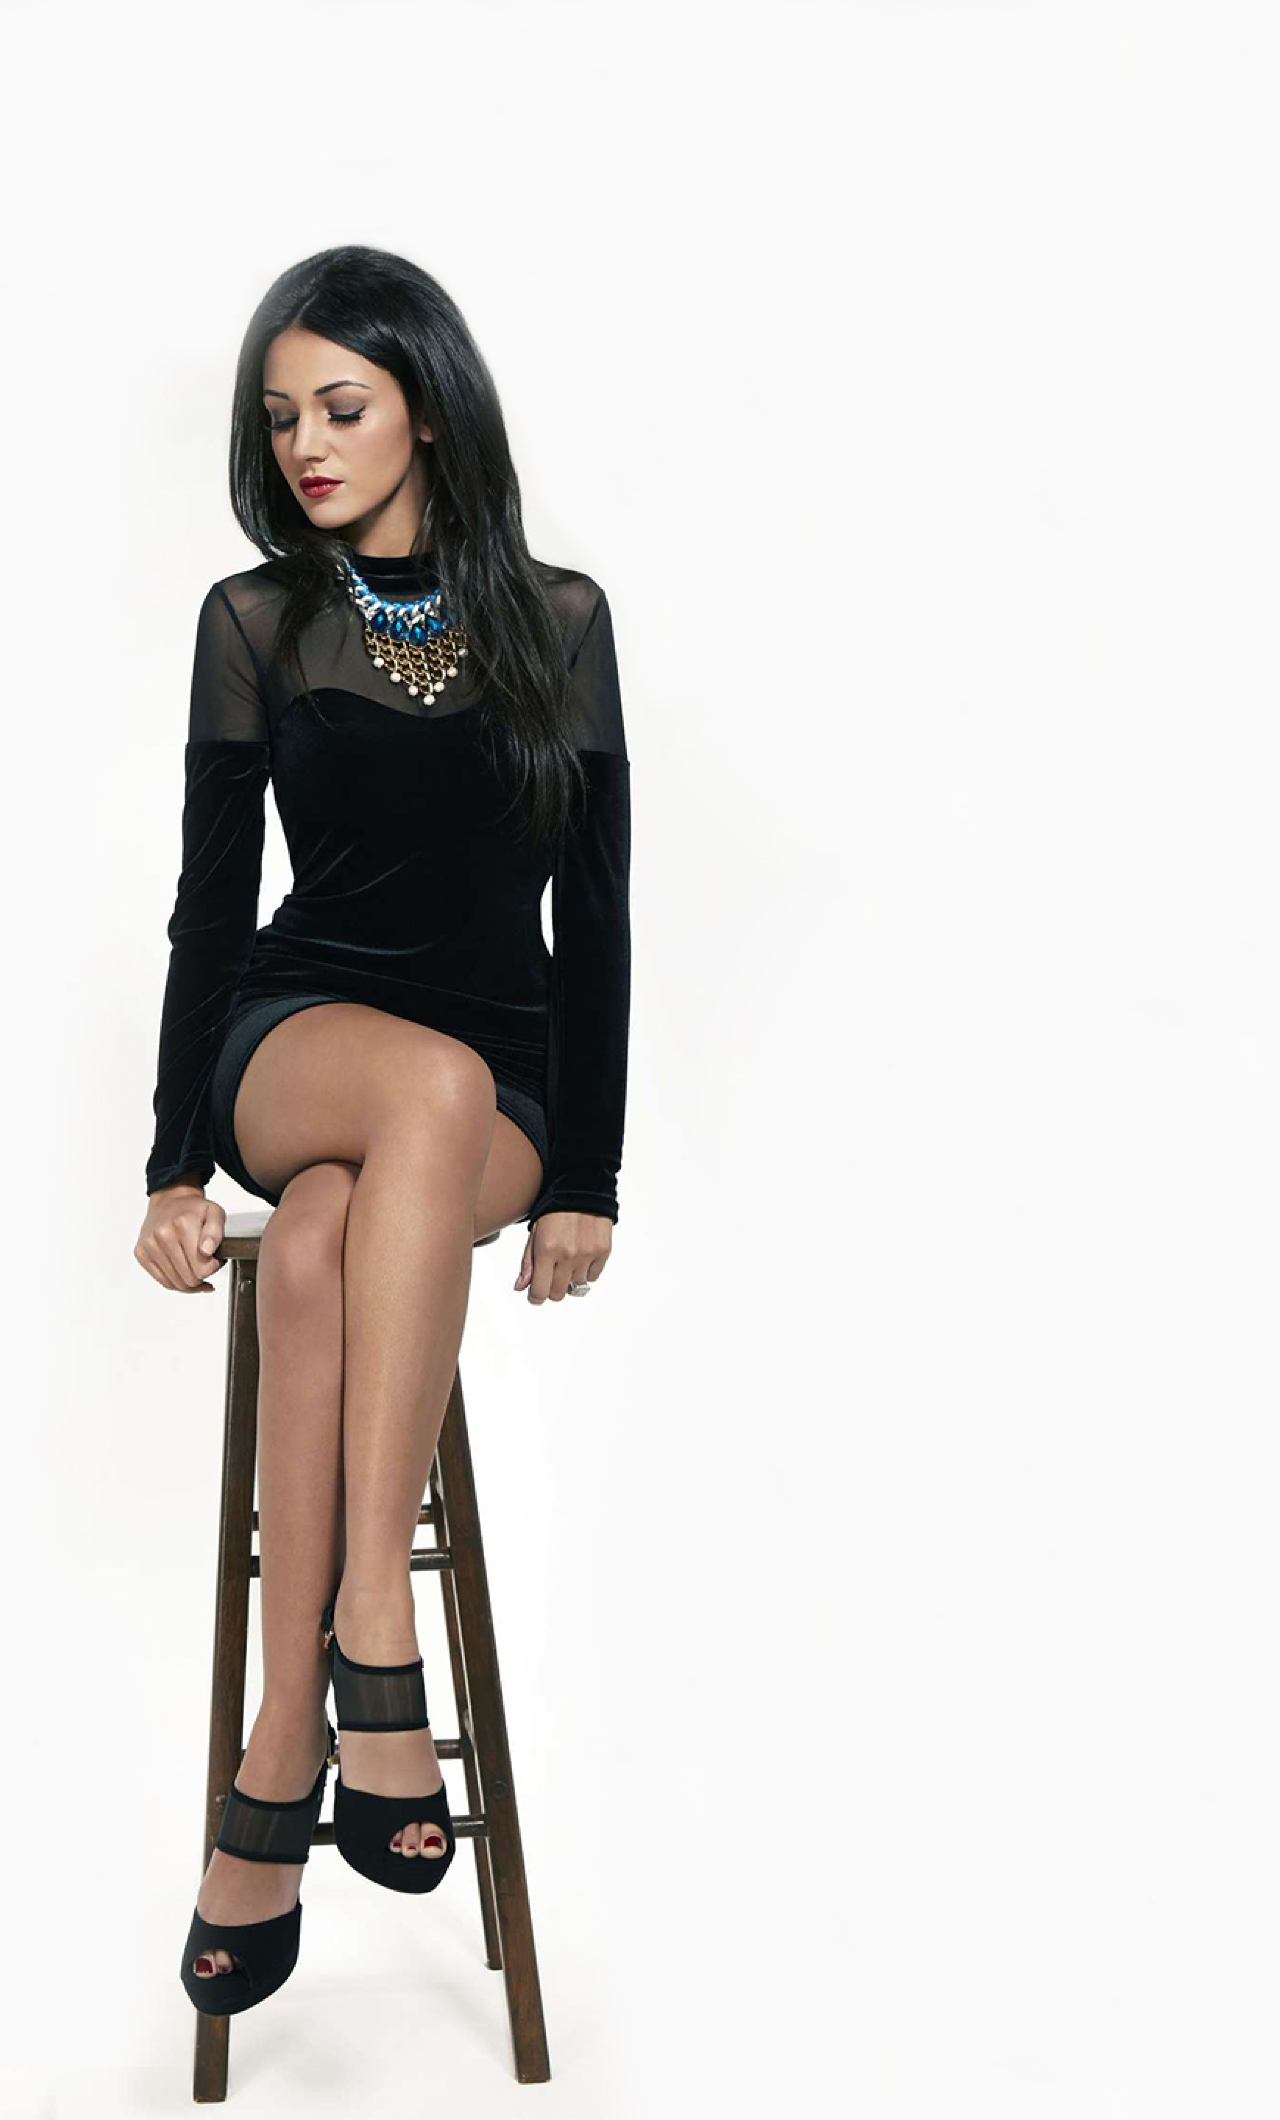 Download Michelle Keegan In Black 320x480 Resolution, Full